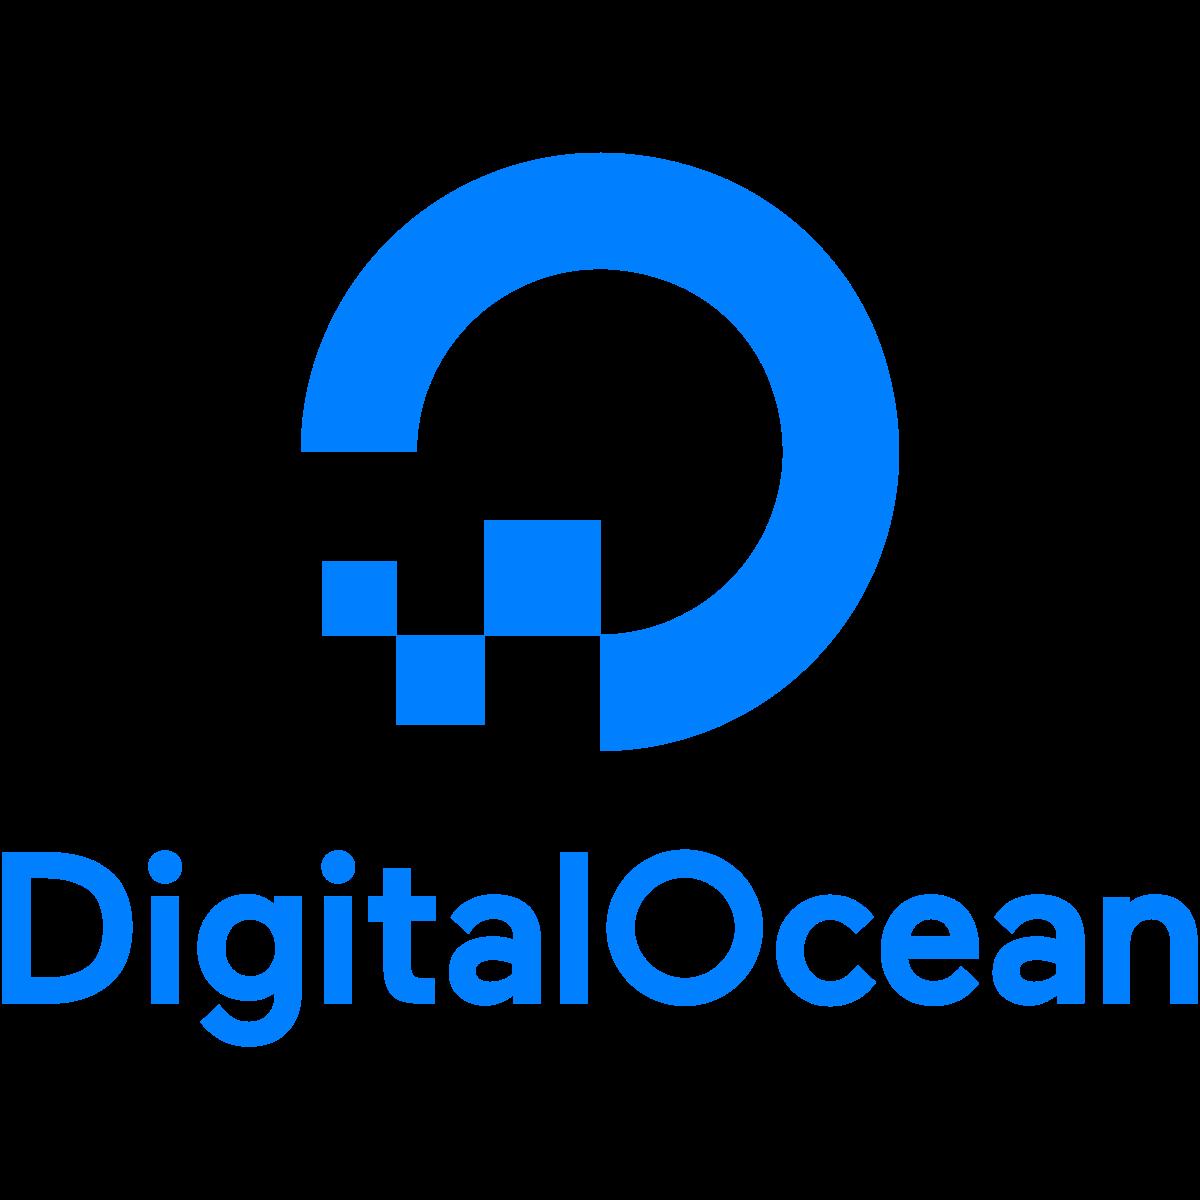 DigitalOcean Sponsor